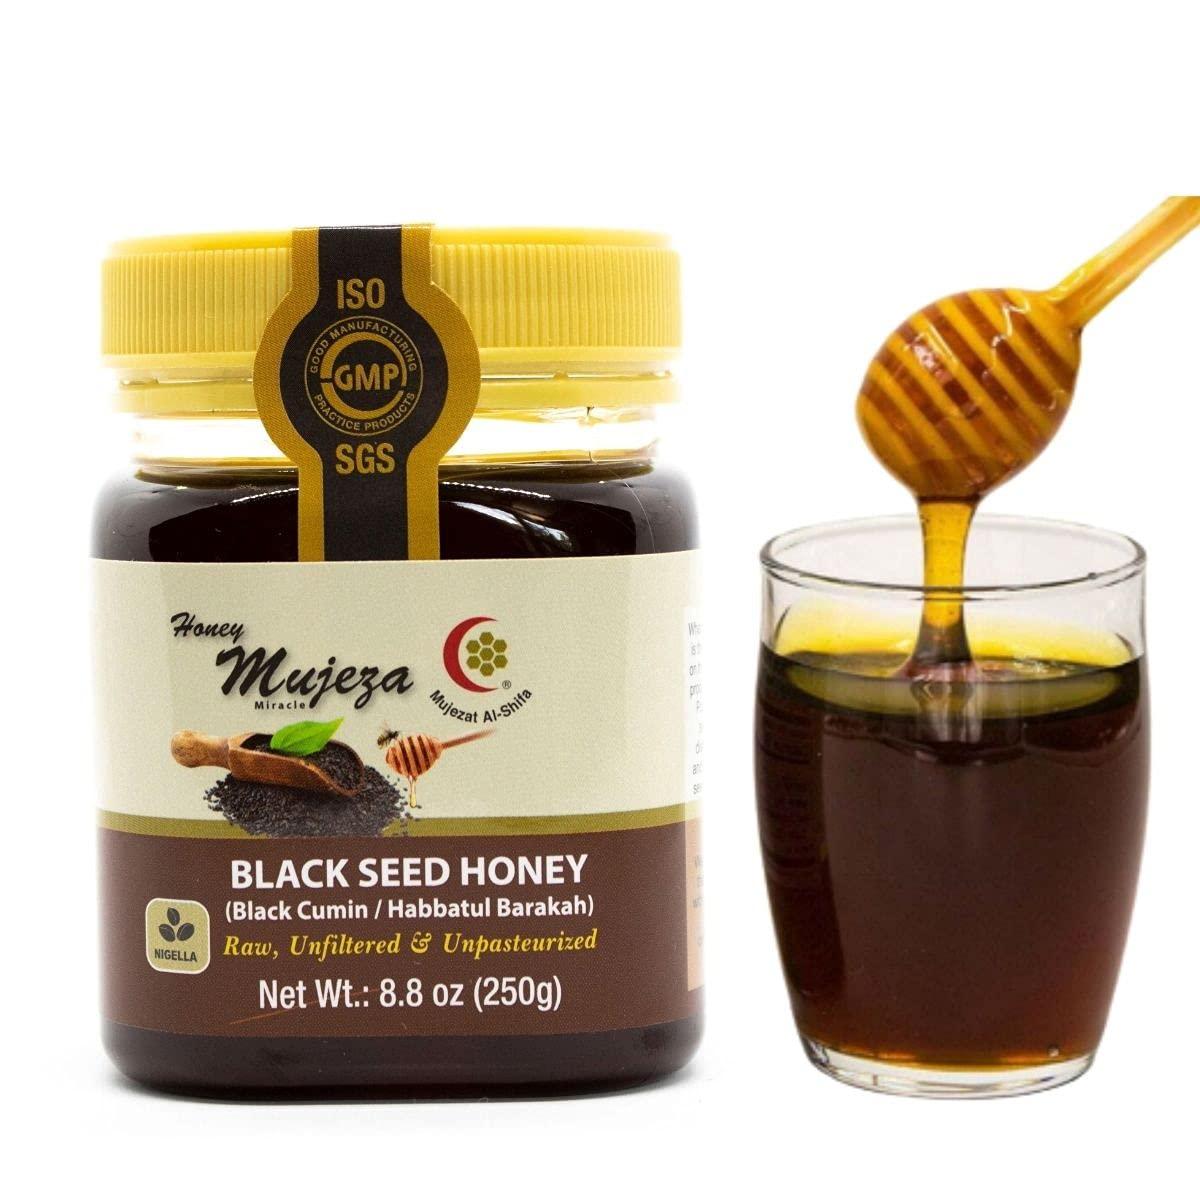 Mujeza Black Seed Honey - (Black cumin - nigella seeds) - Not Mixed with Oil or Powder - Gluten Free - Non GMO - Organic Honey - Immune Booster - 100% Natural Raw Honey 250g / 8.8oz عسل حبة البركة